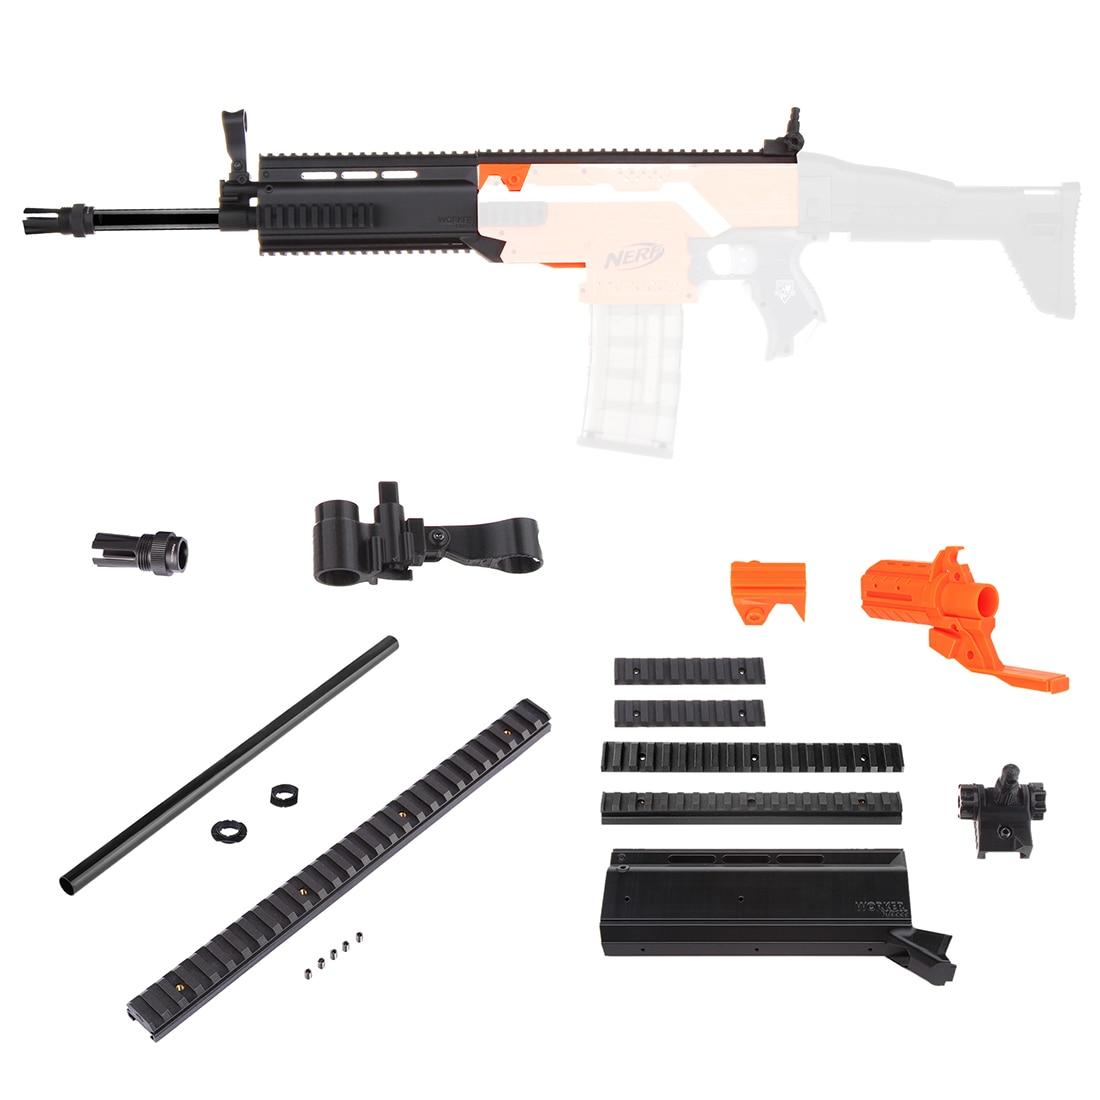 Worker f10555 No.152 STF Barrel Kit for Nerf Stryfe - Black Type B worker f10555 no 152 stf type b set professional toy gun accessories for nerf stryfe black